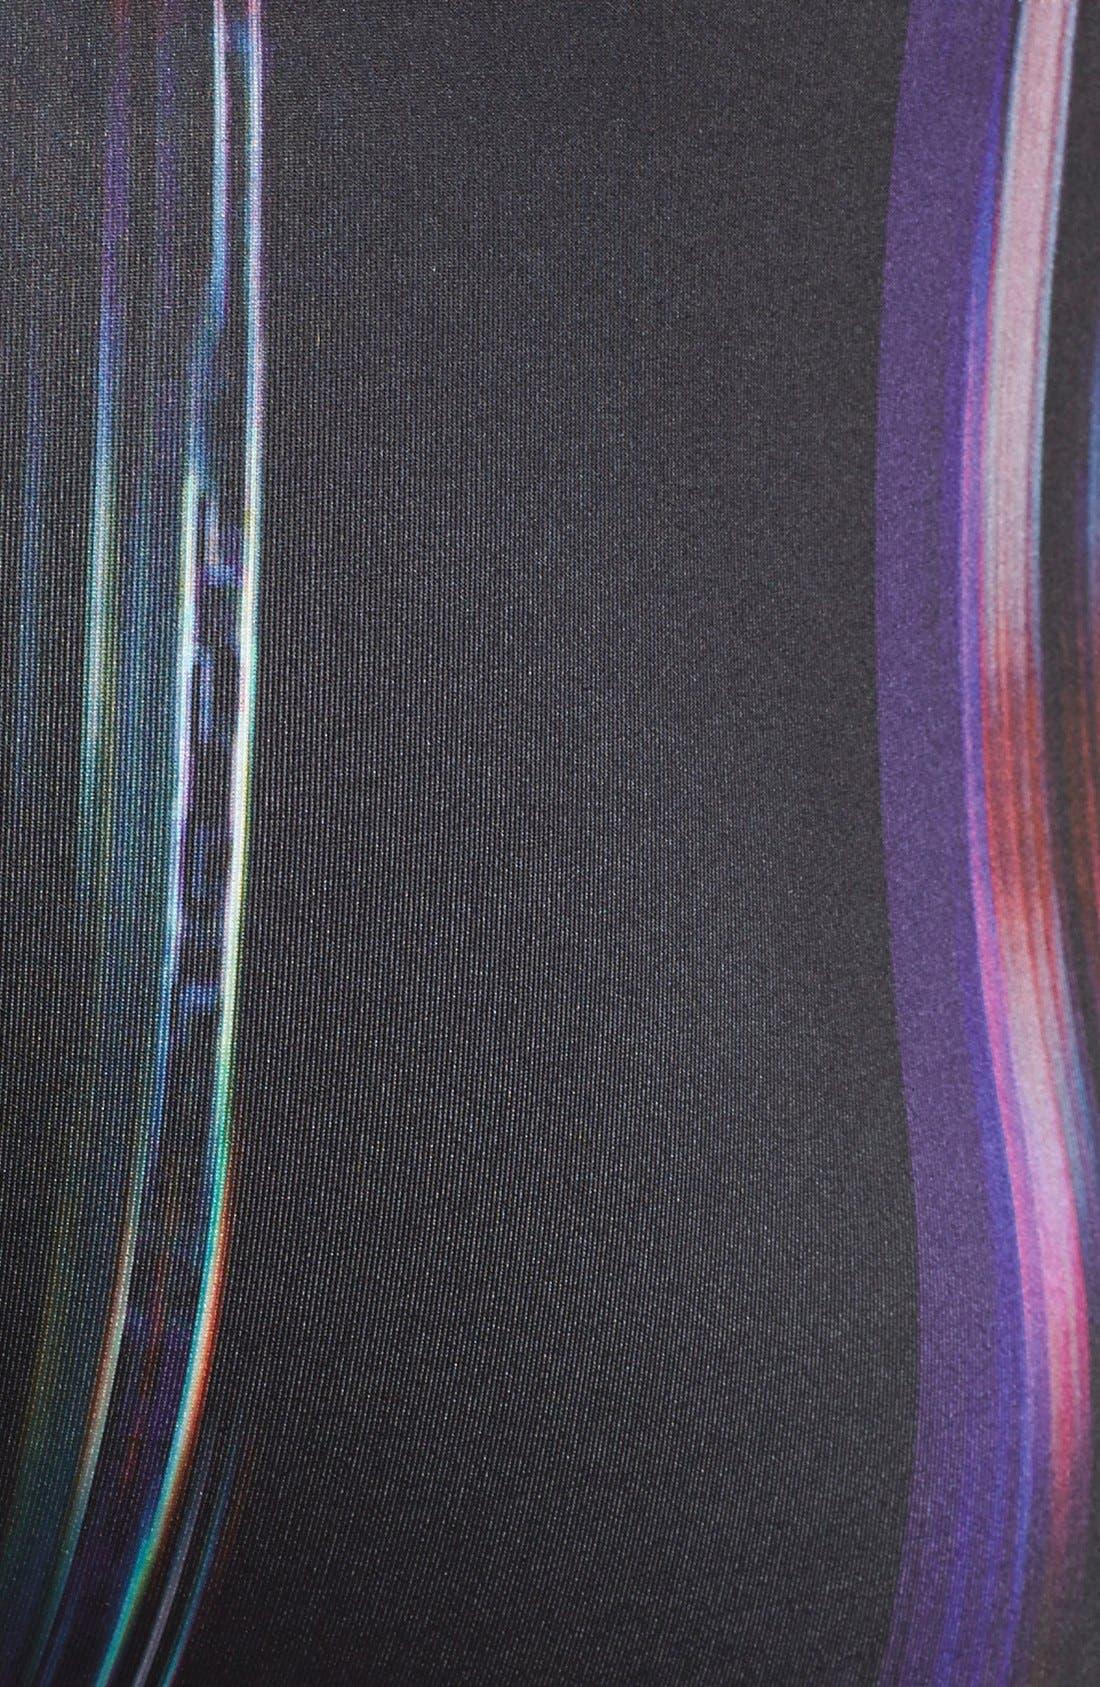 Sliq Micro Trunks,                             Alternate thumbnail 4, color,                             003